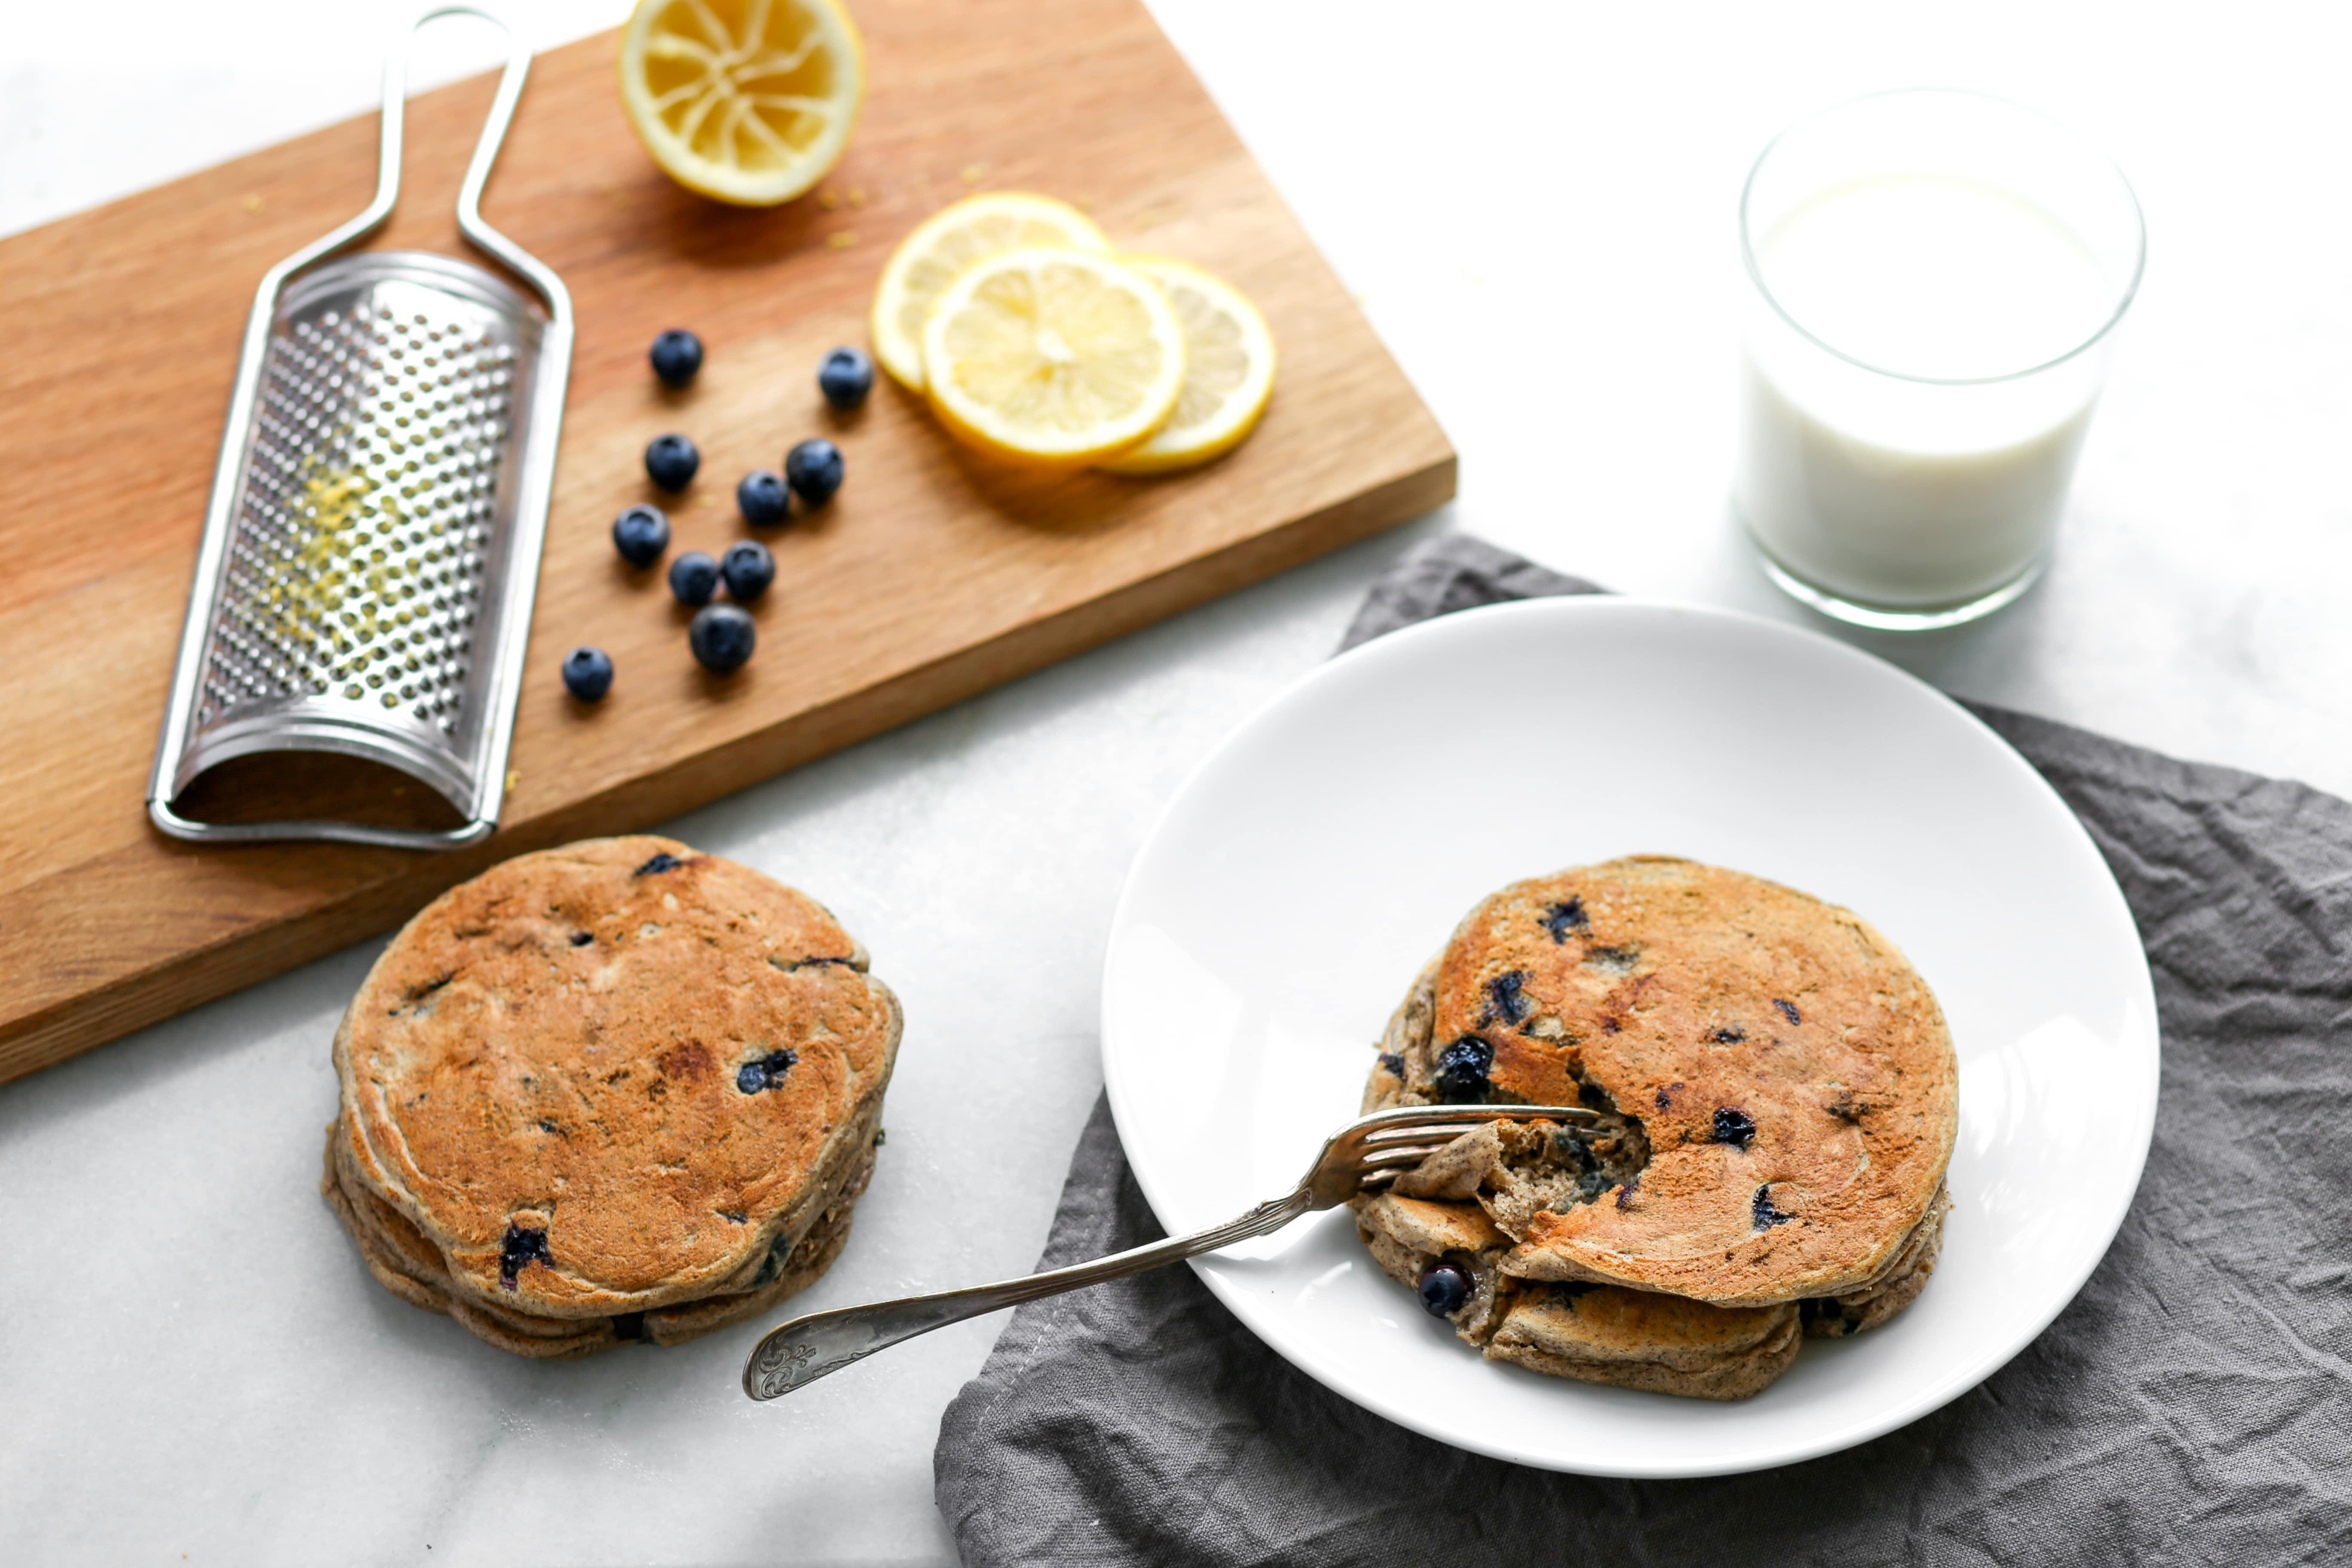 Lemon-Blueberry Buckwheat Ricotta Pancakes